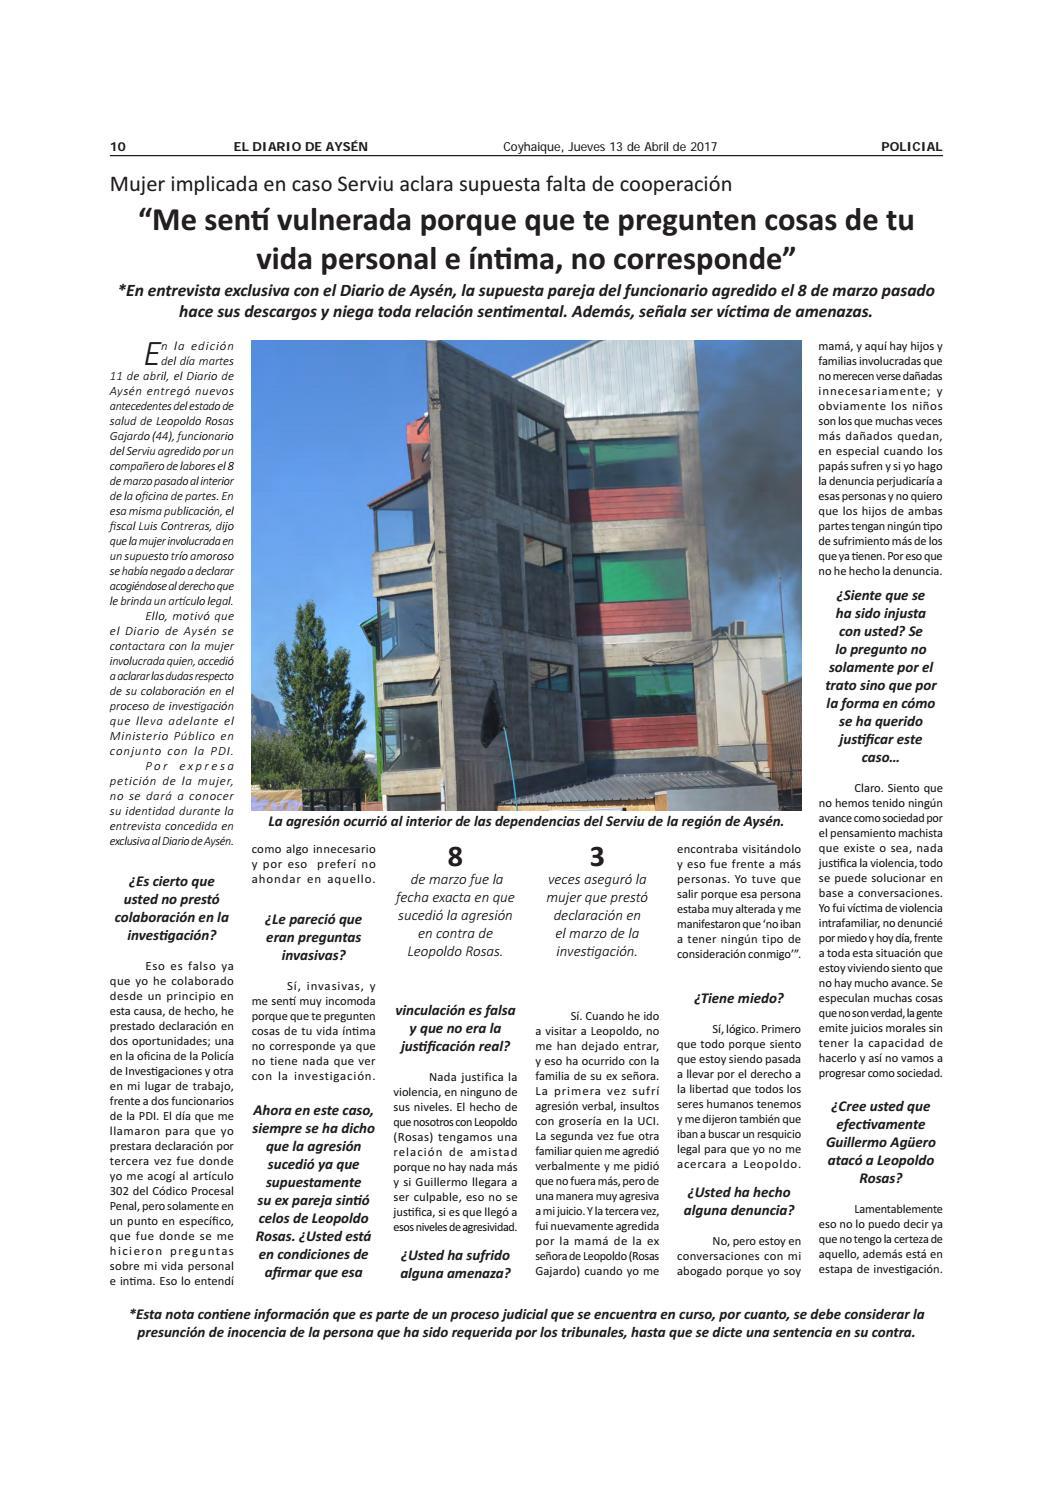 13042017 by diario ays n page 10 issuu for Que oficina de inem me corresponde